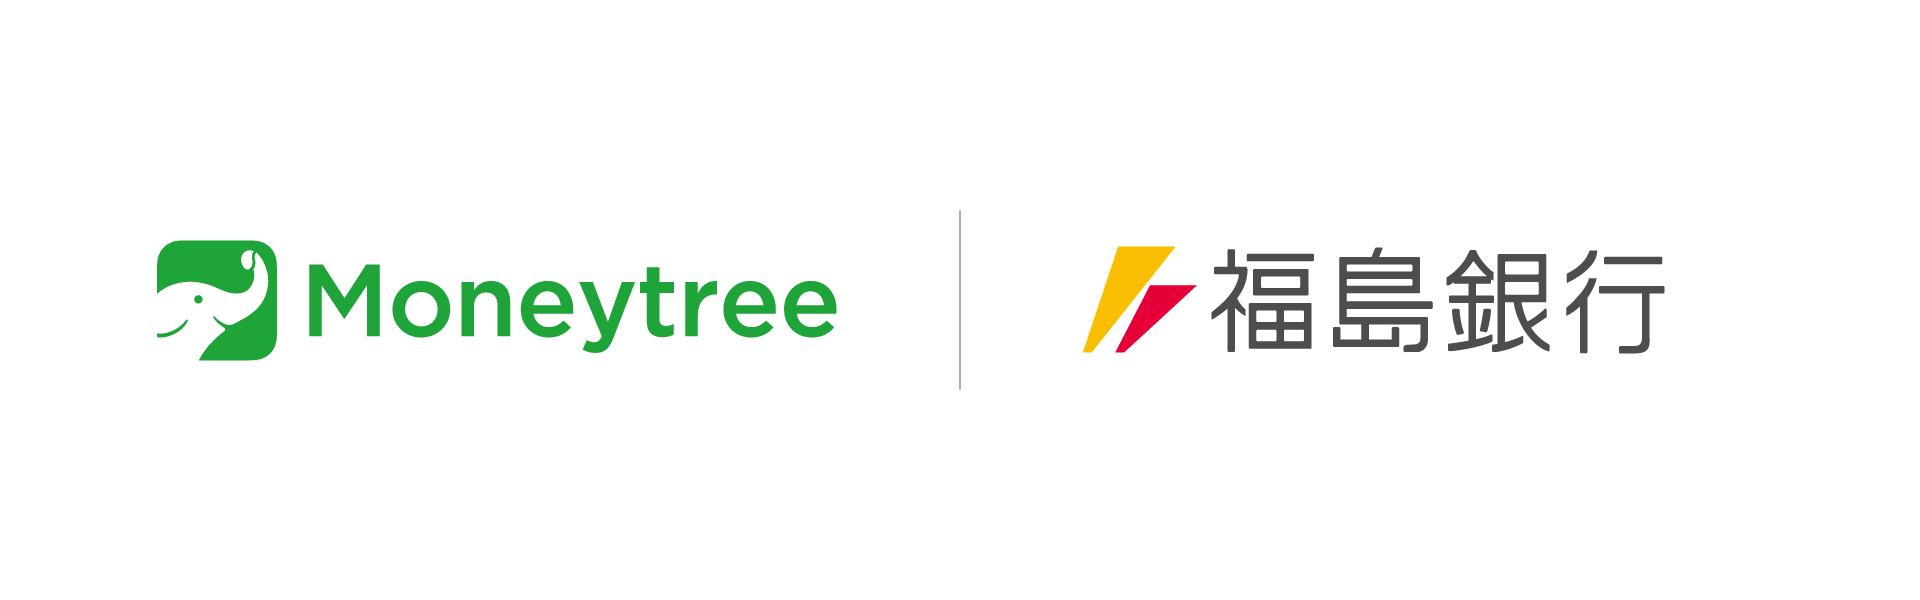 PressRelease FukushimaBank Logo